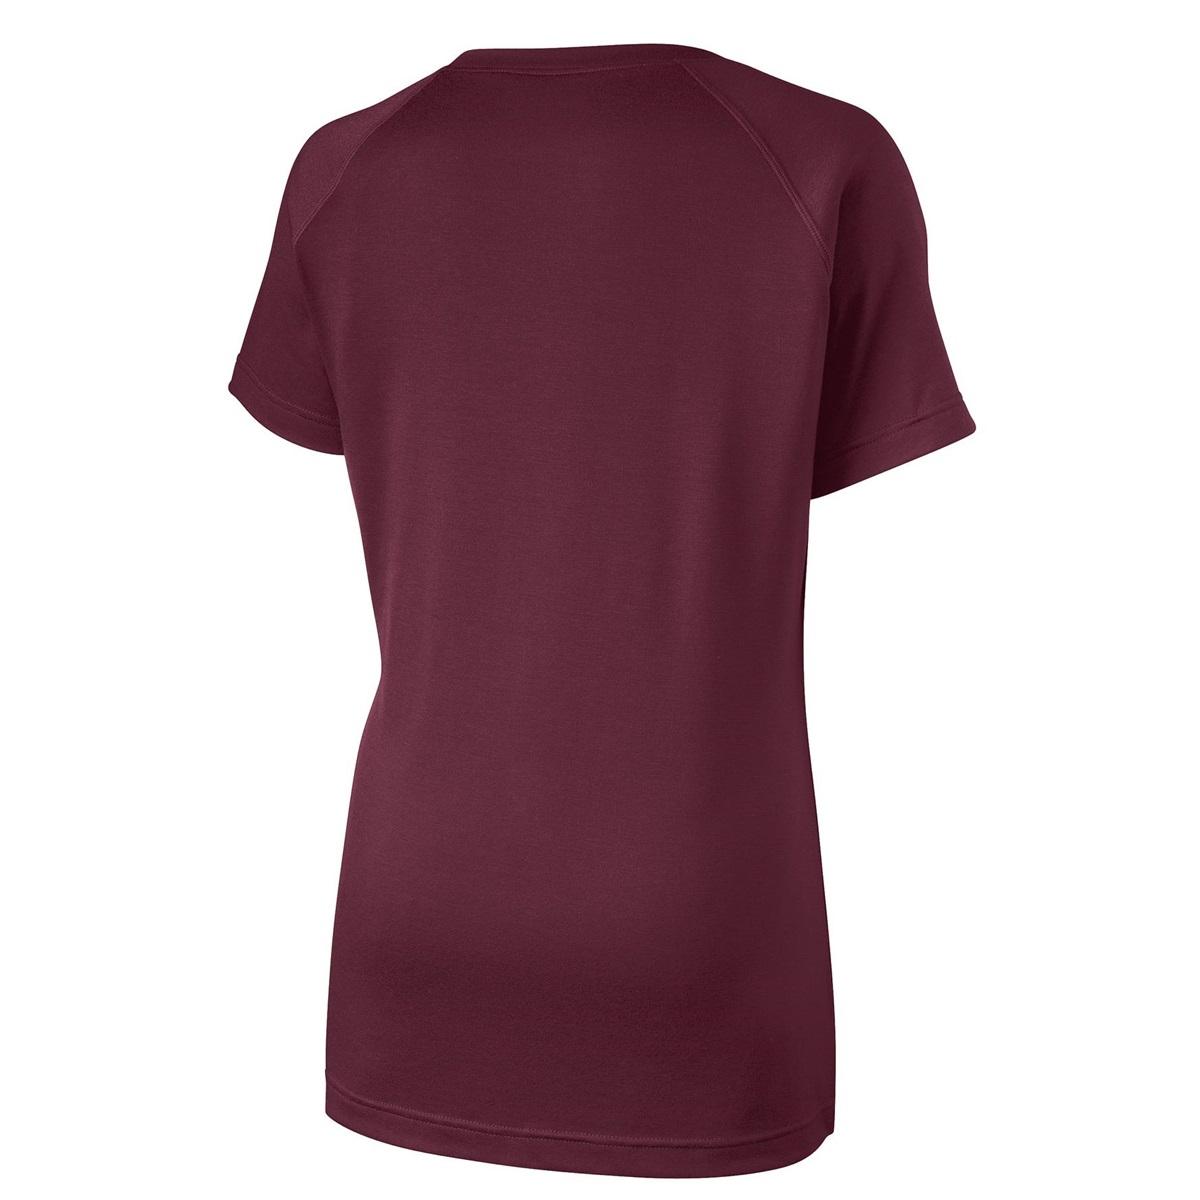 Cool Classic Womens Burgundy Long Sleeve Asymmetrical TShirt Dress